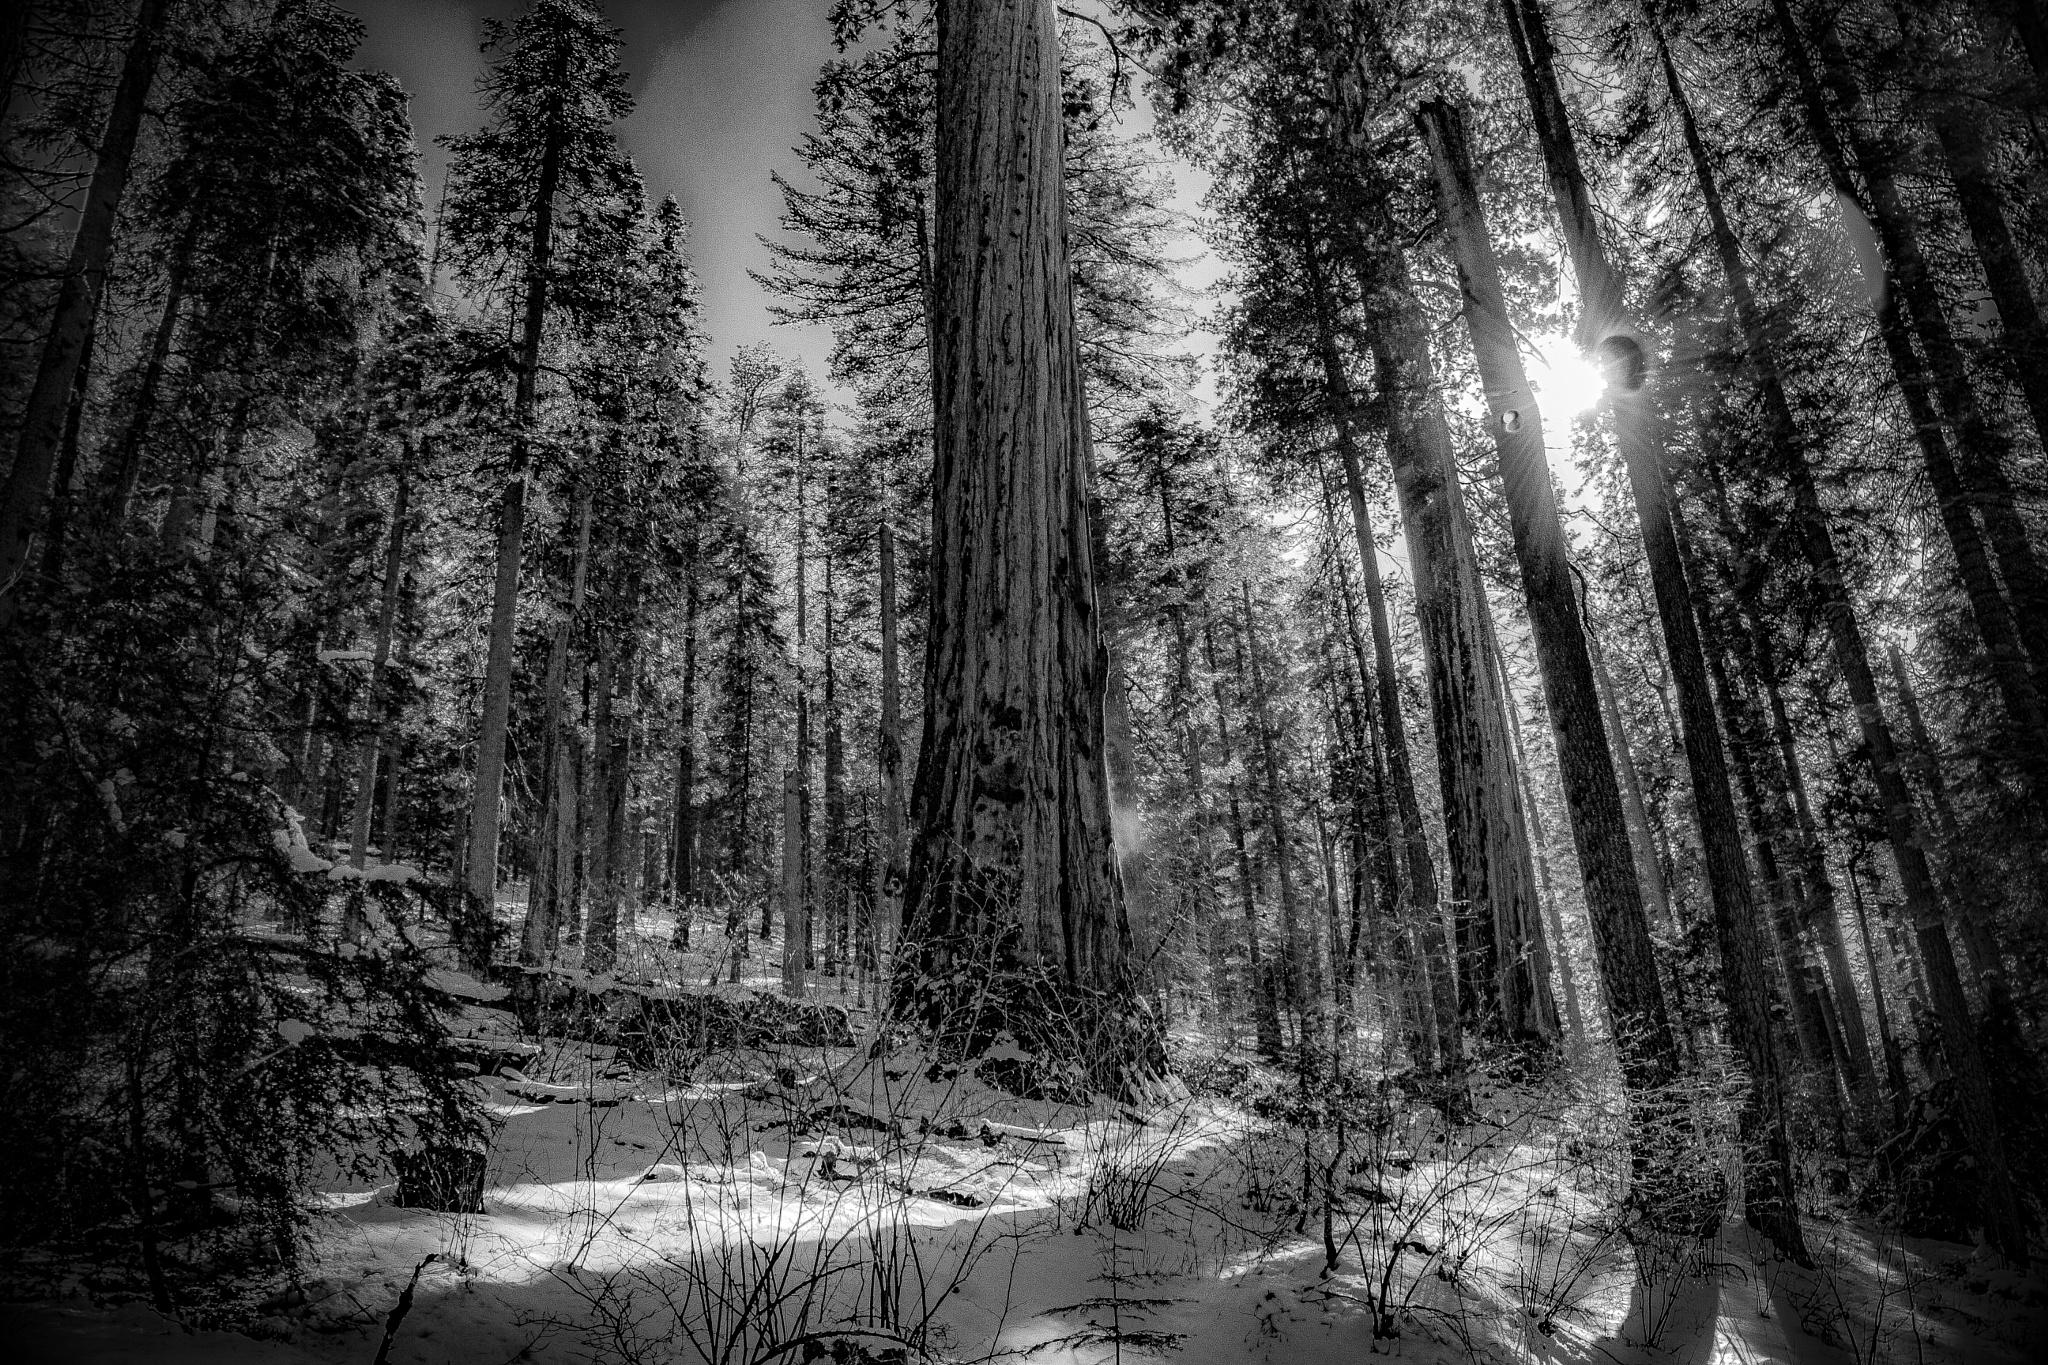 B&W sequoia by Moonzo